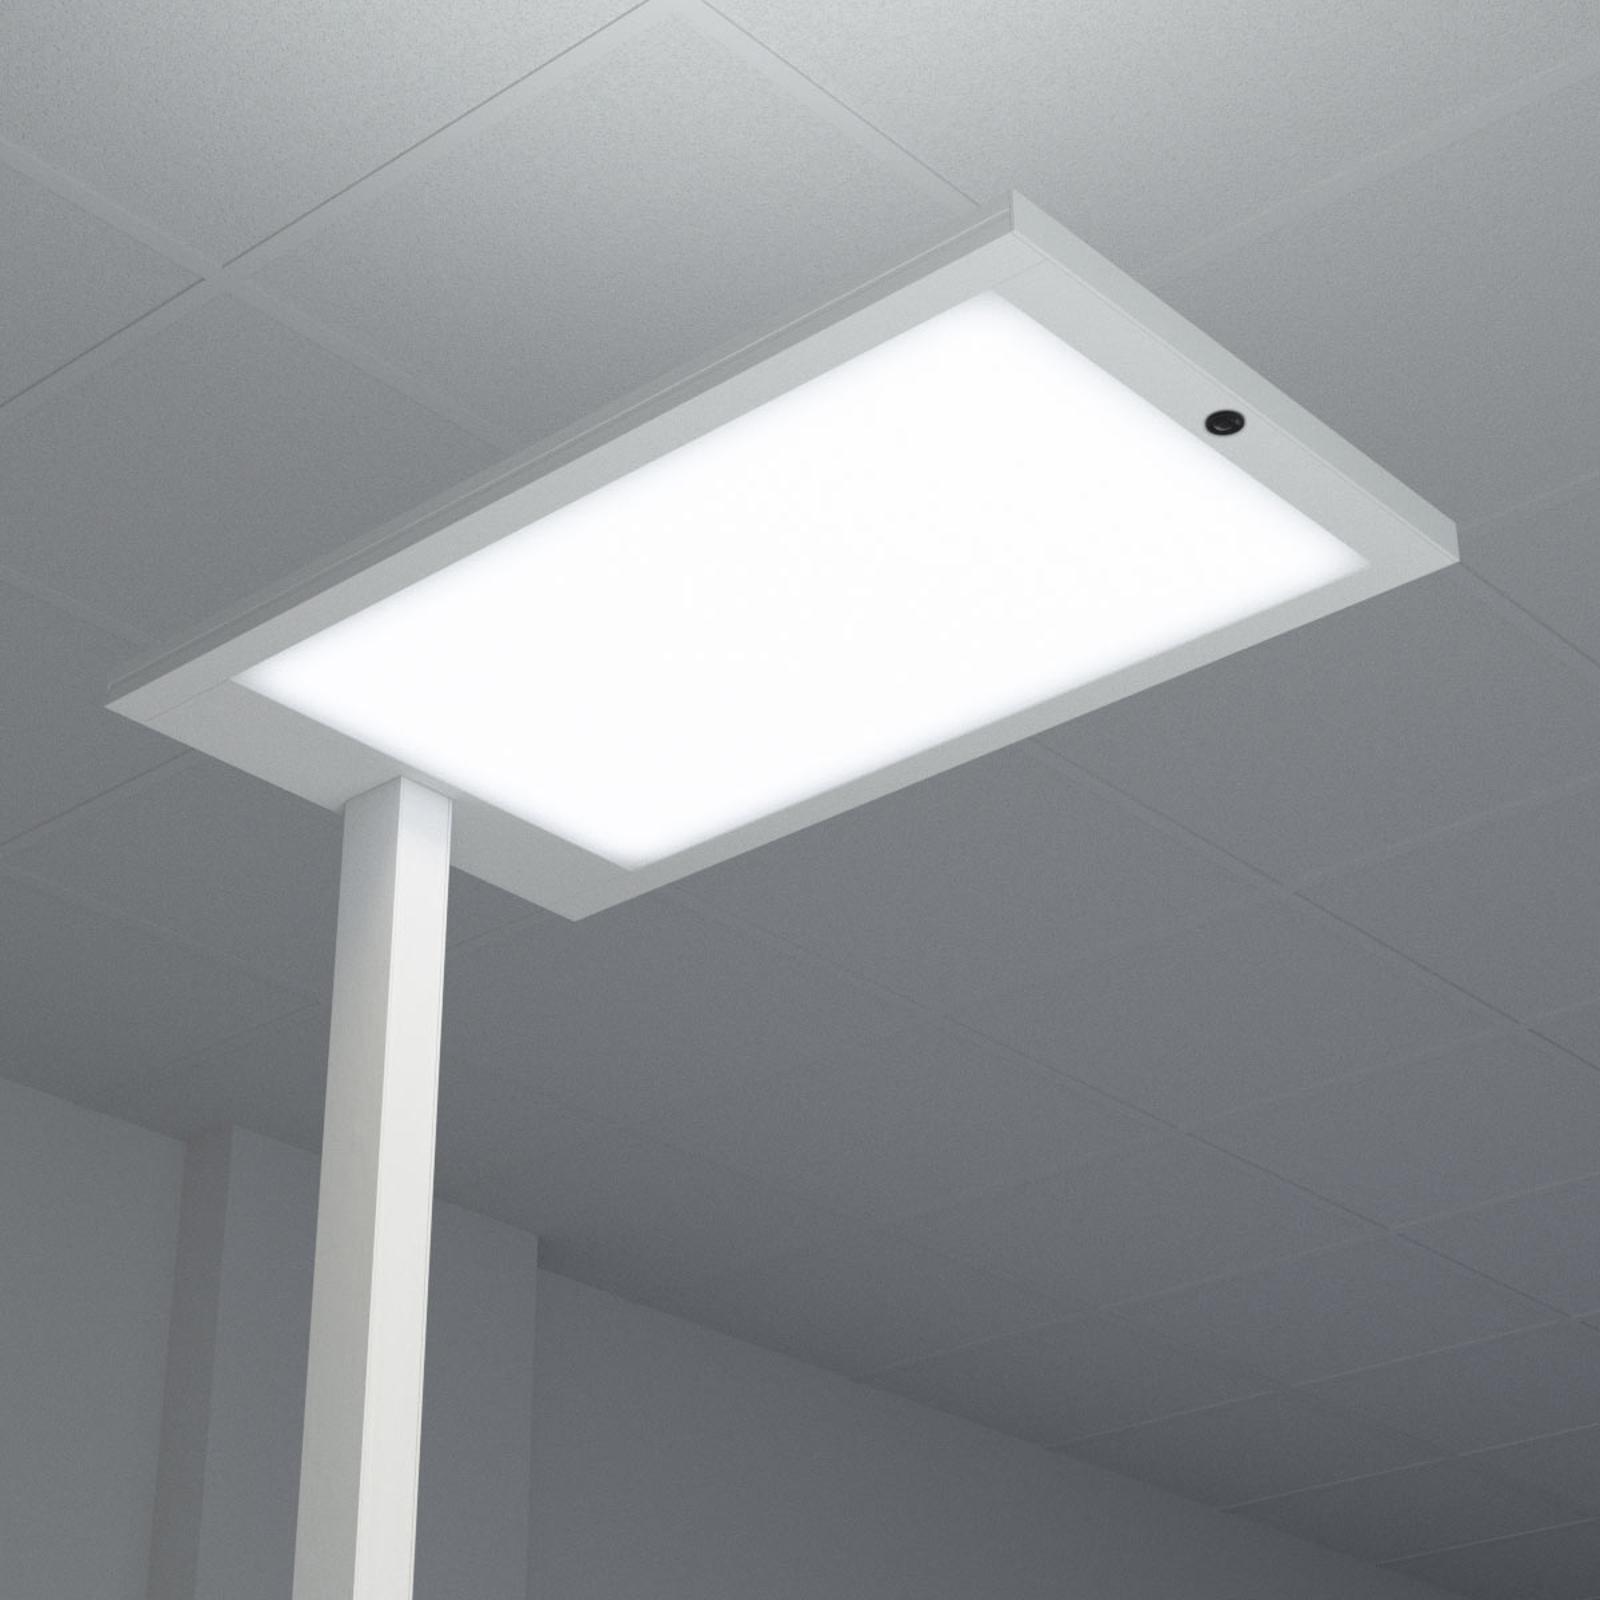 Almira LED-gulvlampe til kontor med dæmper, sølv